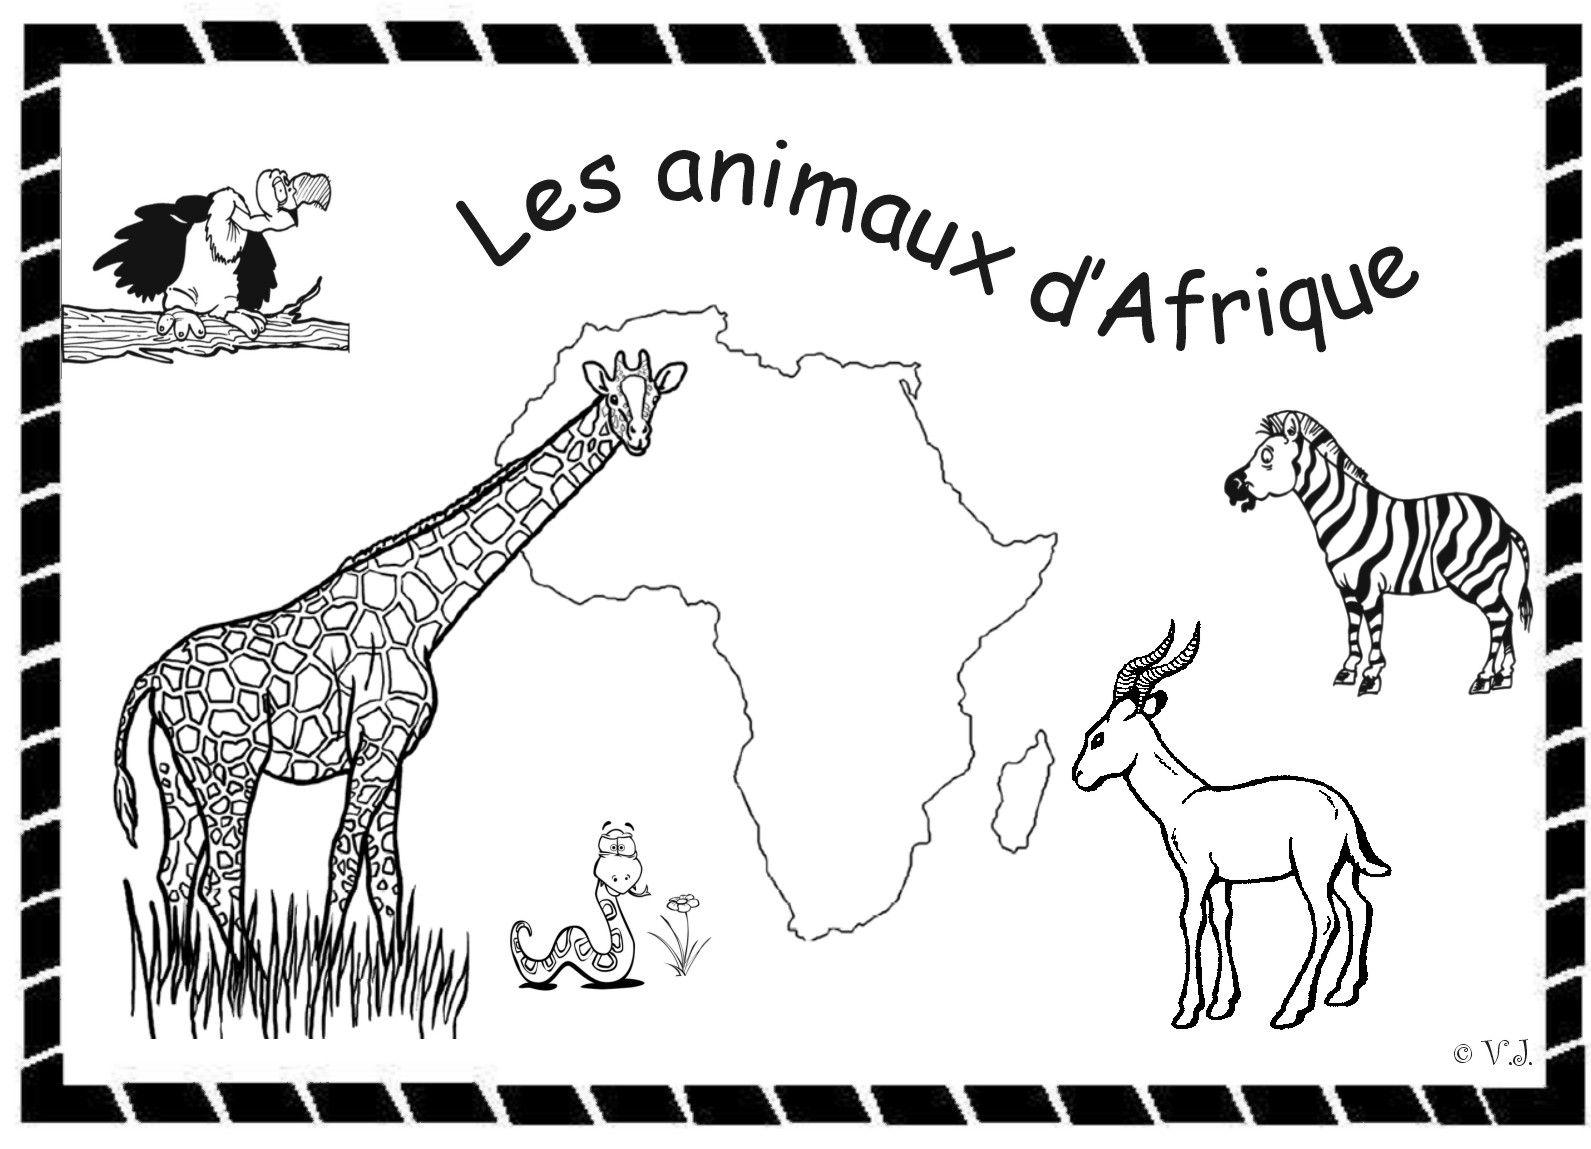 Coloriage Afrique Noire | Coloriage, Afrique, Coloriage Animaux à Coloriage Afrique À Imprimer